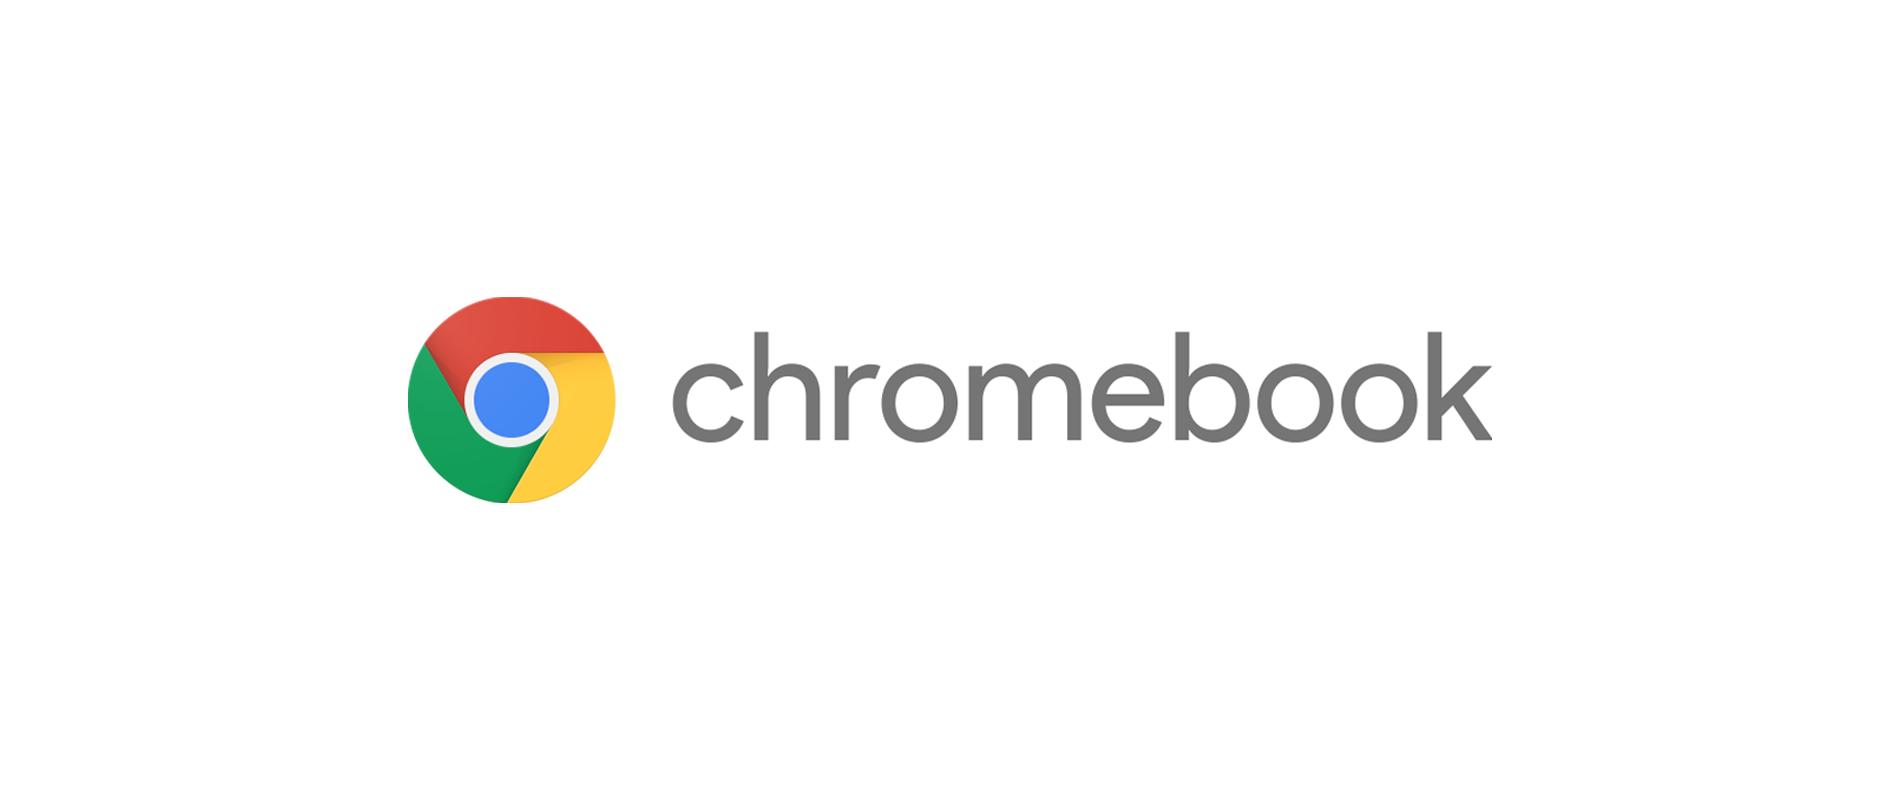 chromebook-01-wordmark-h.max-1920x1070